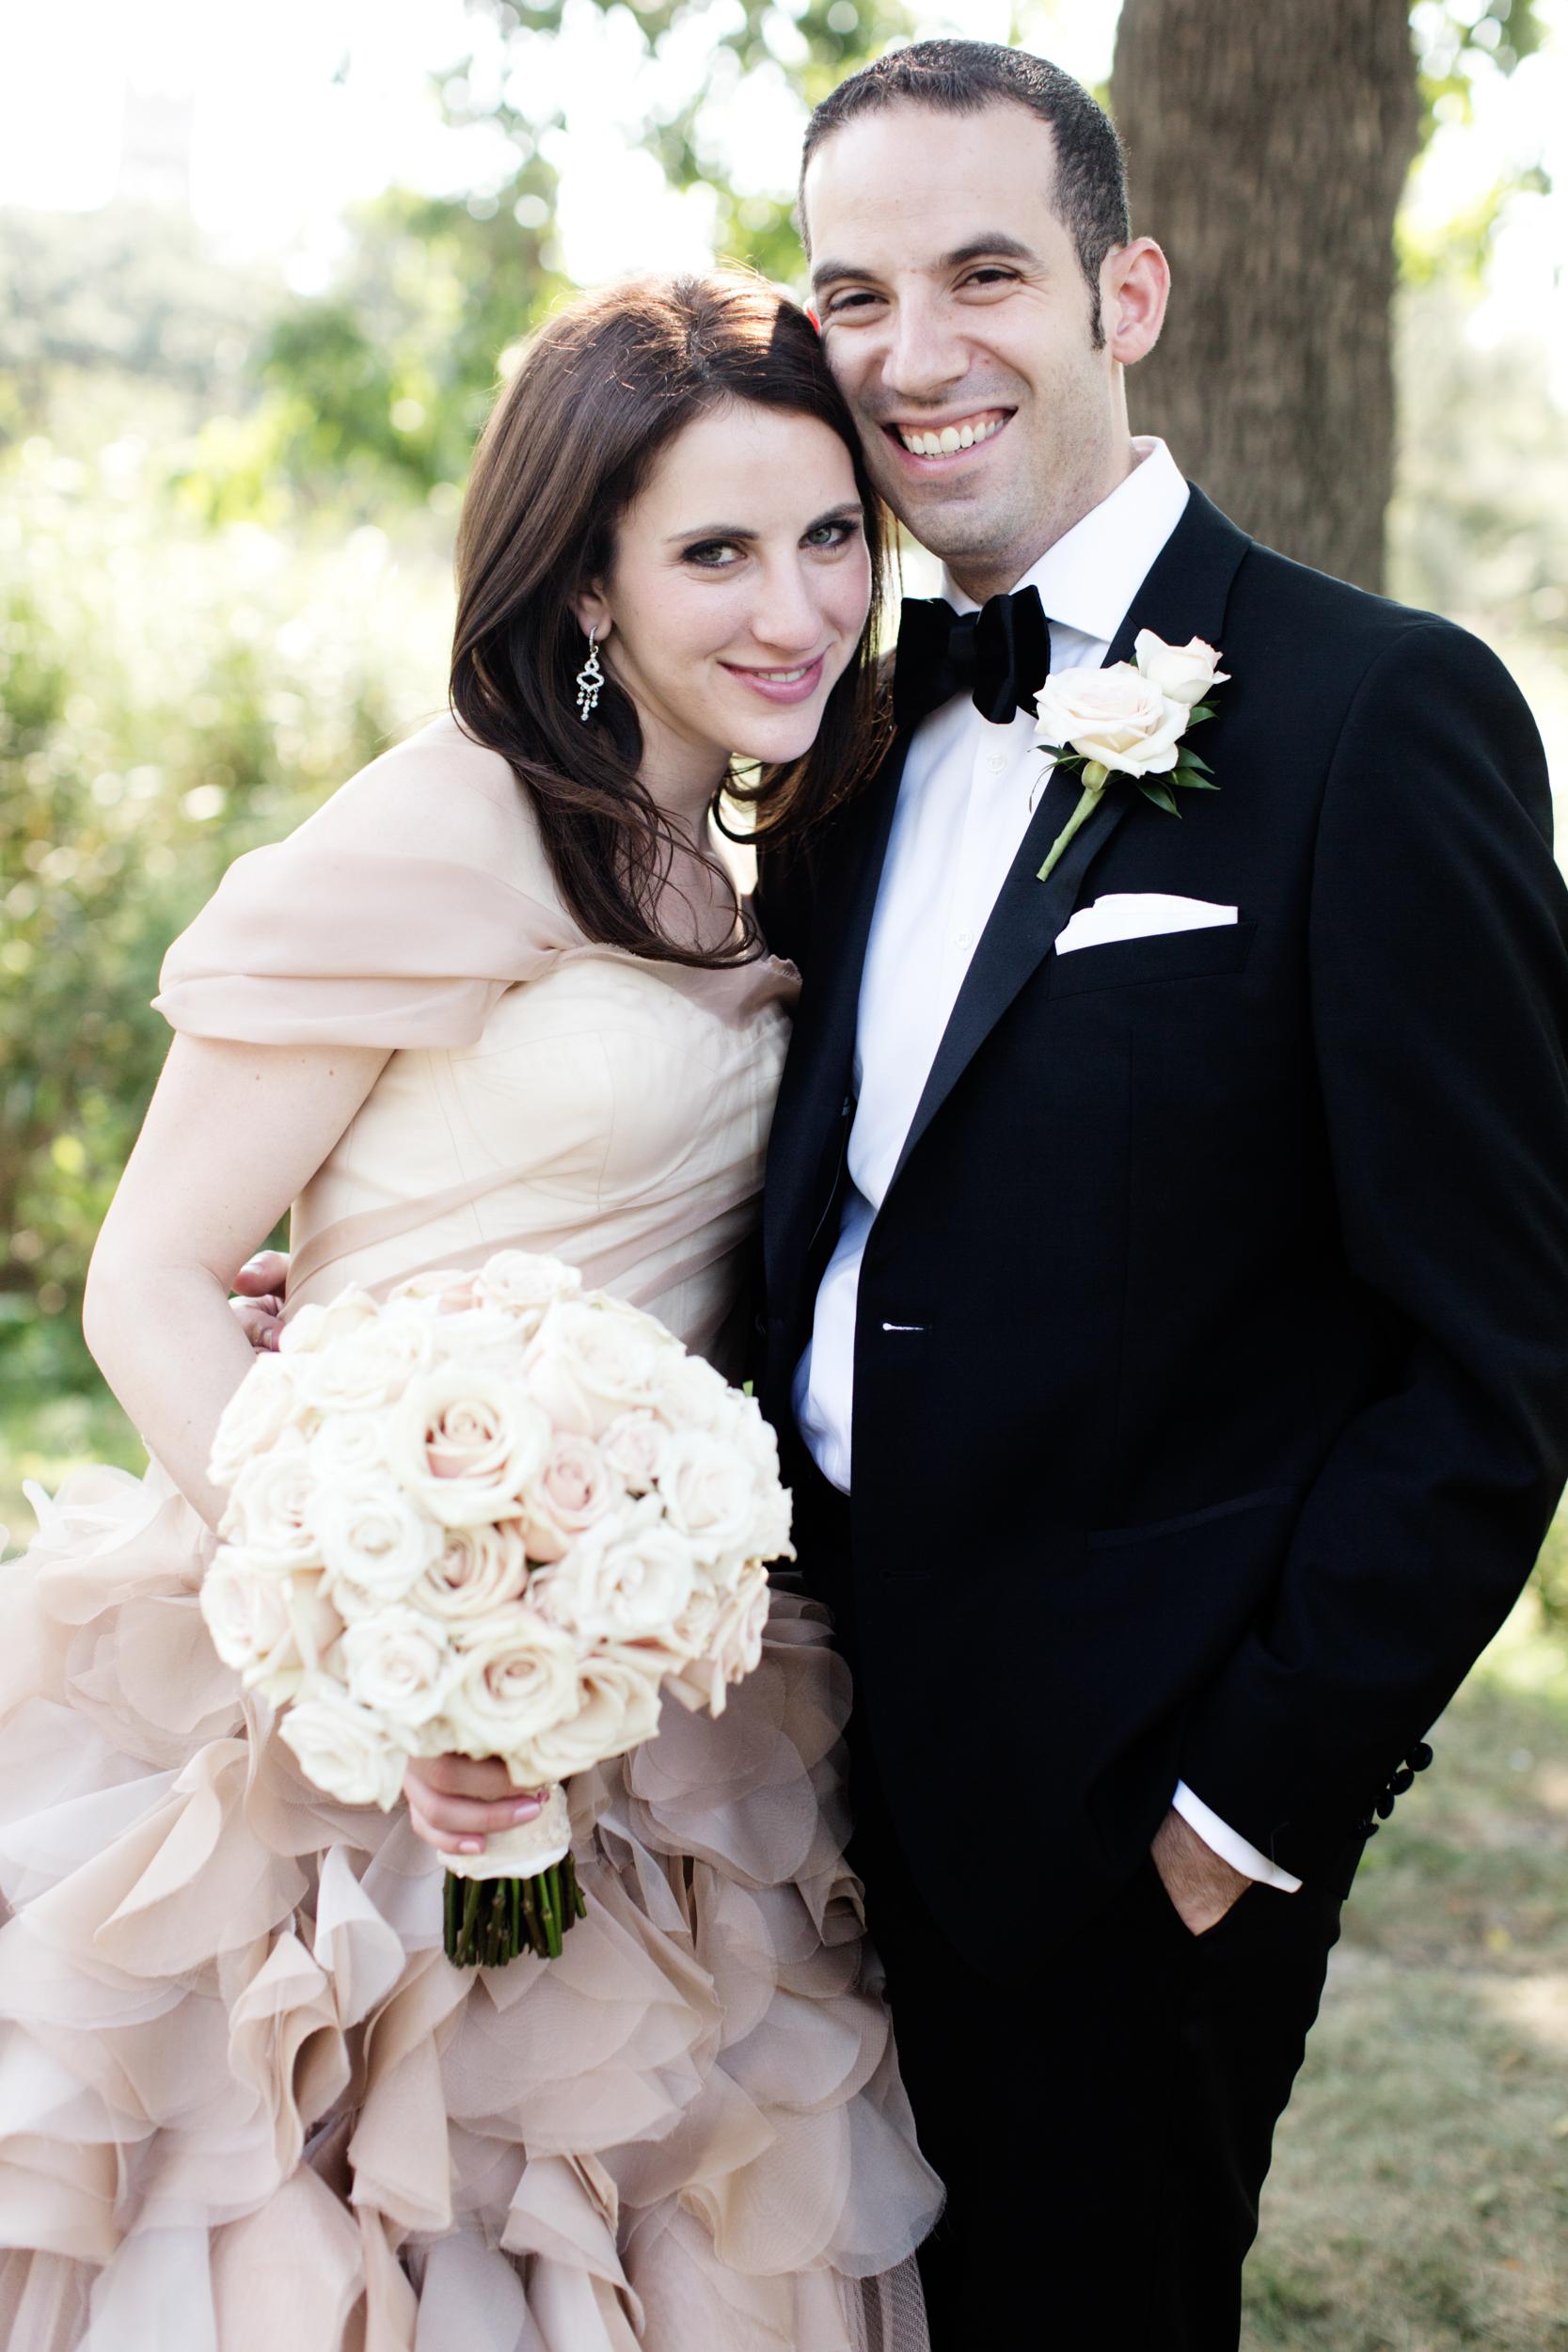 Ceci_New_York_Ceci_Style_Ceci_Johnson_Luxury_Lifestyle_Floral_Lace_Wedding_Letterpress_Inspiration_Design_Custom_Couture_Personalized_Invitations_-93.jpg